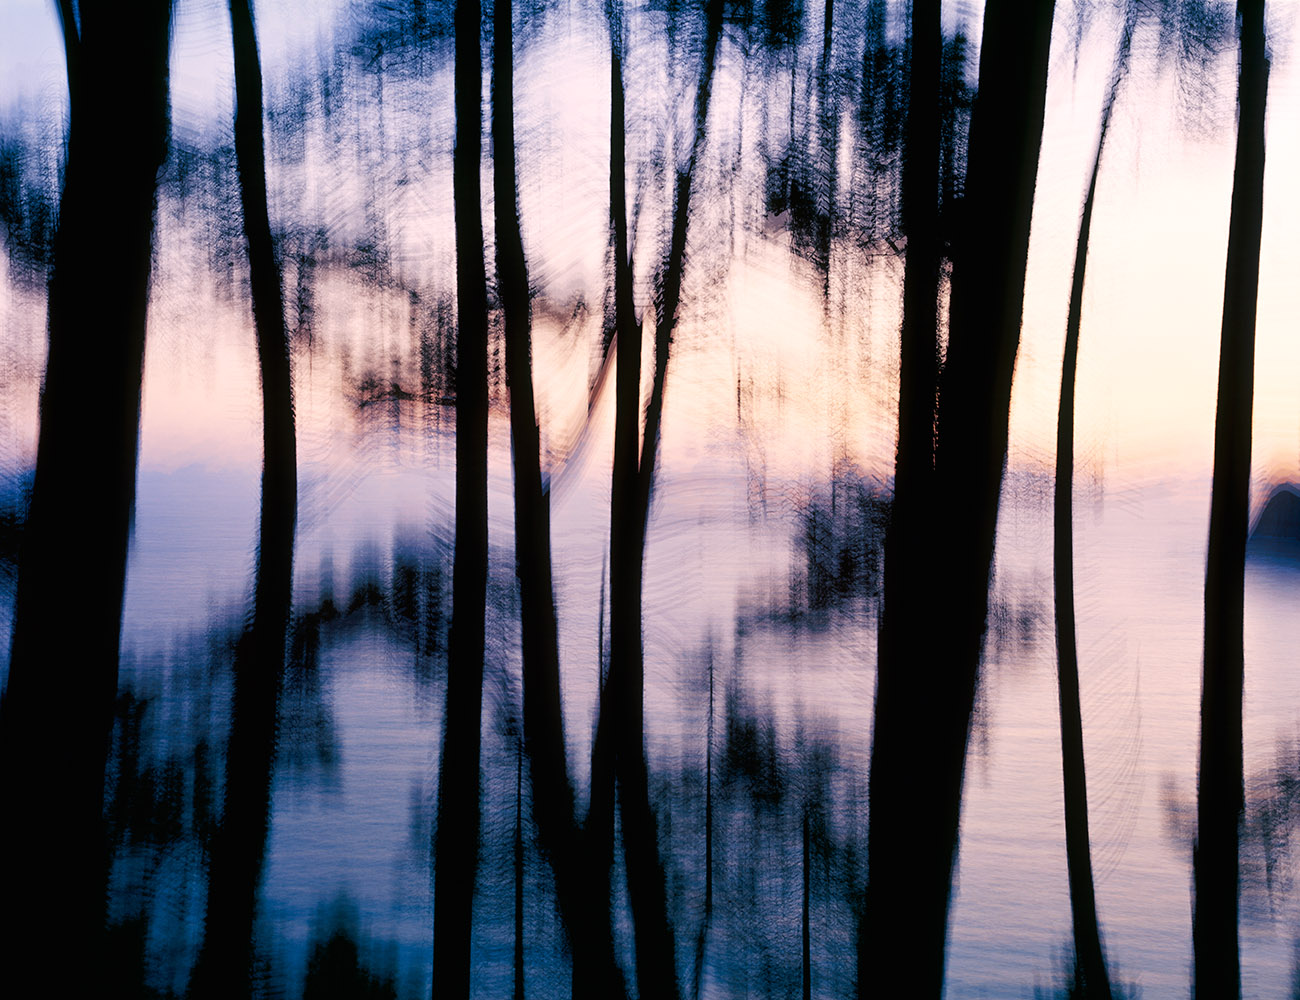 El bosque multiplicado - FERNANDO PUCHE,  NATURE  PHOTOGRAPHY  BEYOND  OBVIOUS